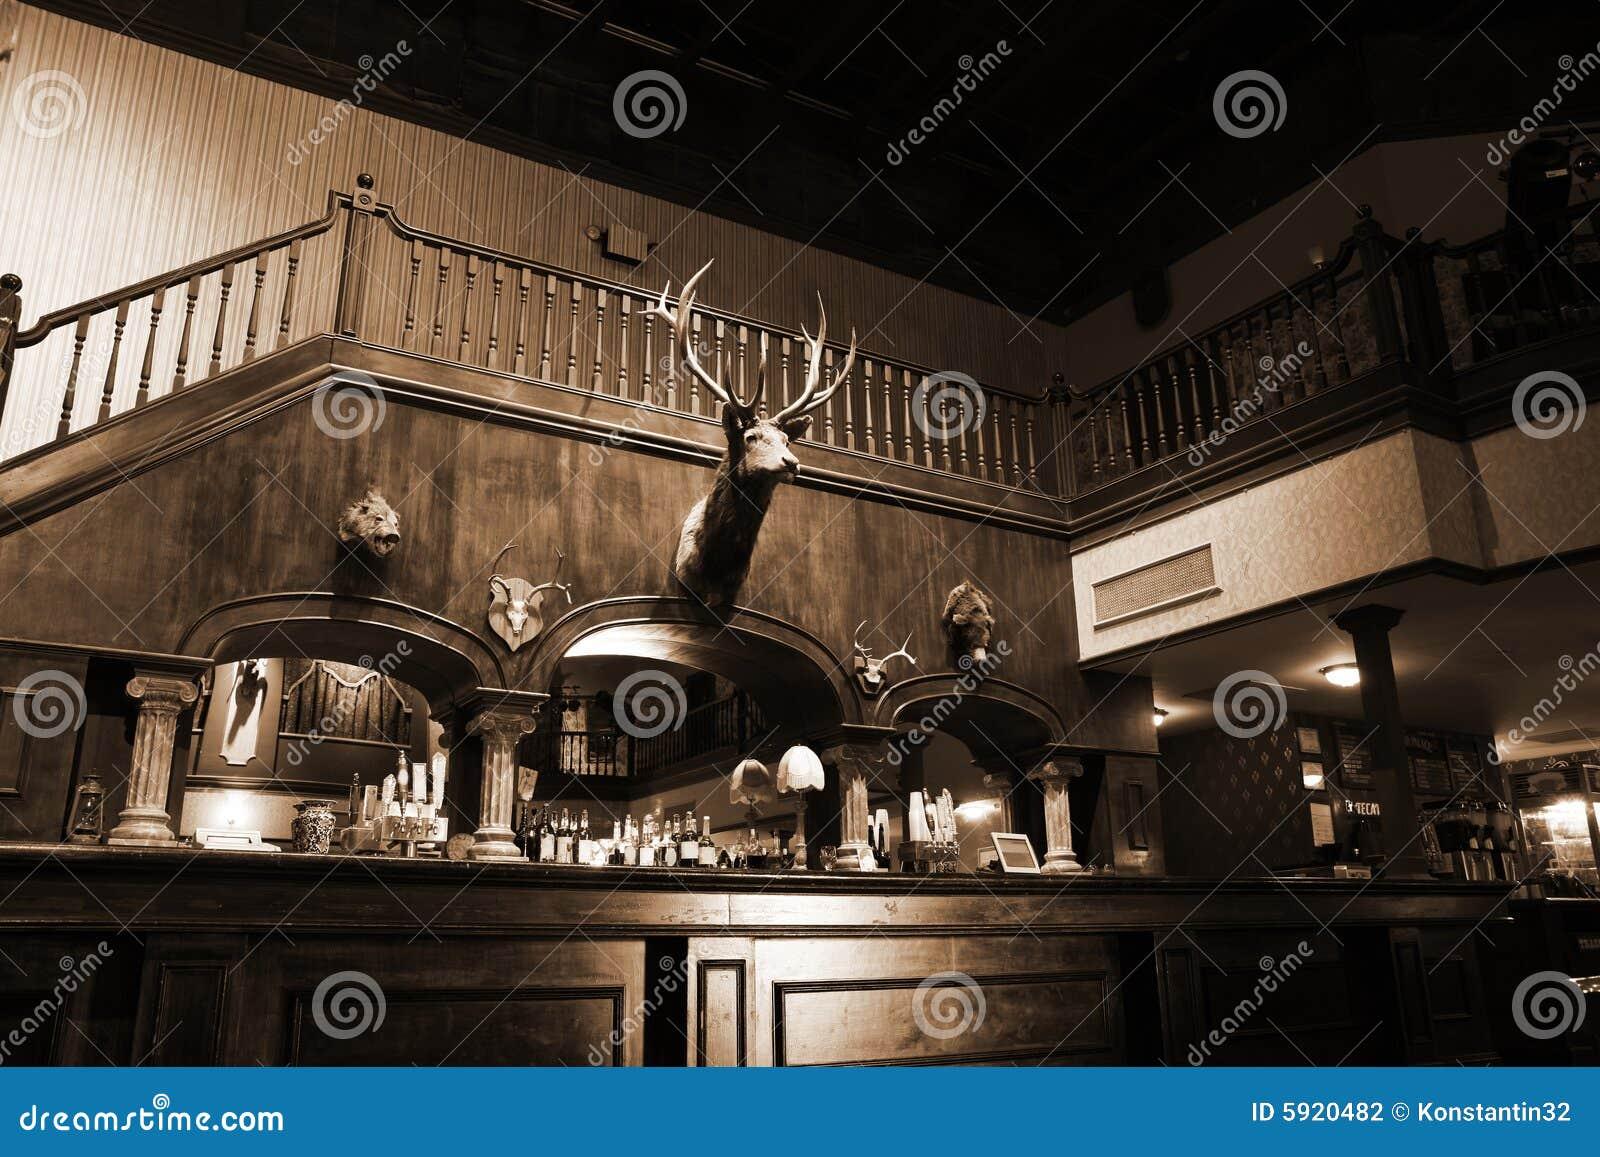 Stylish Night Bar With Retro Decor In Sepia Stock Photo - Image of ...